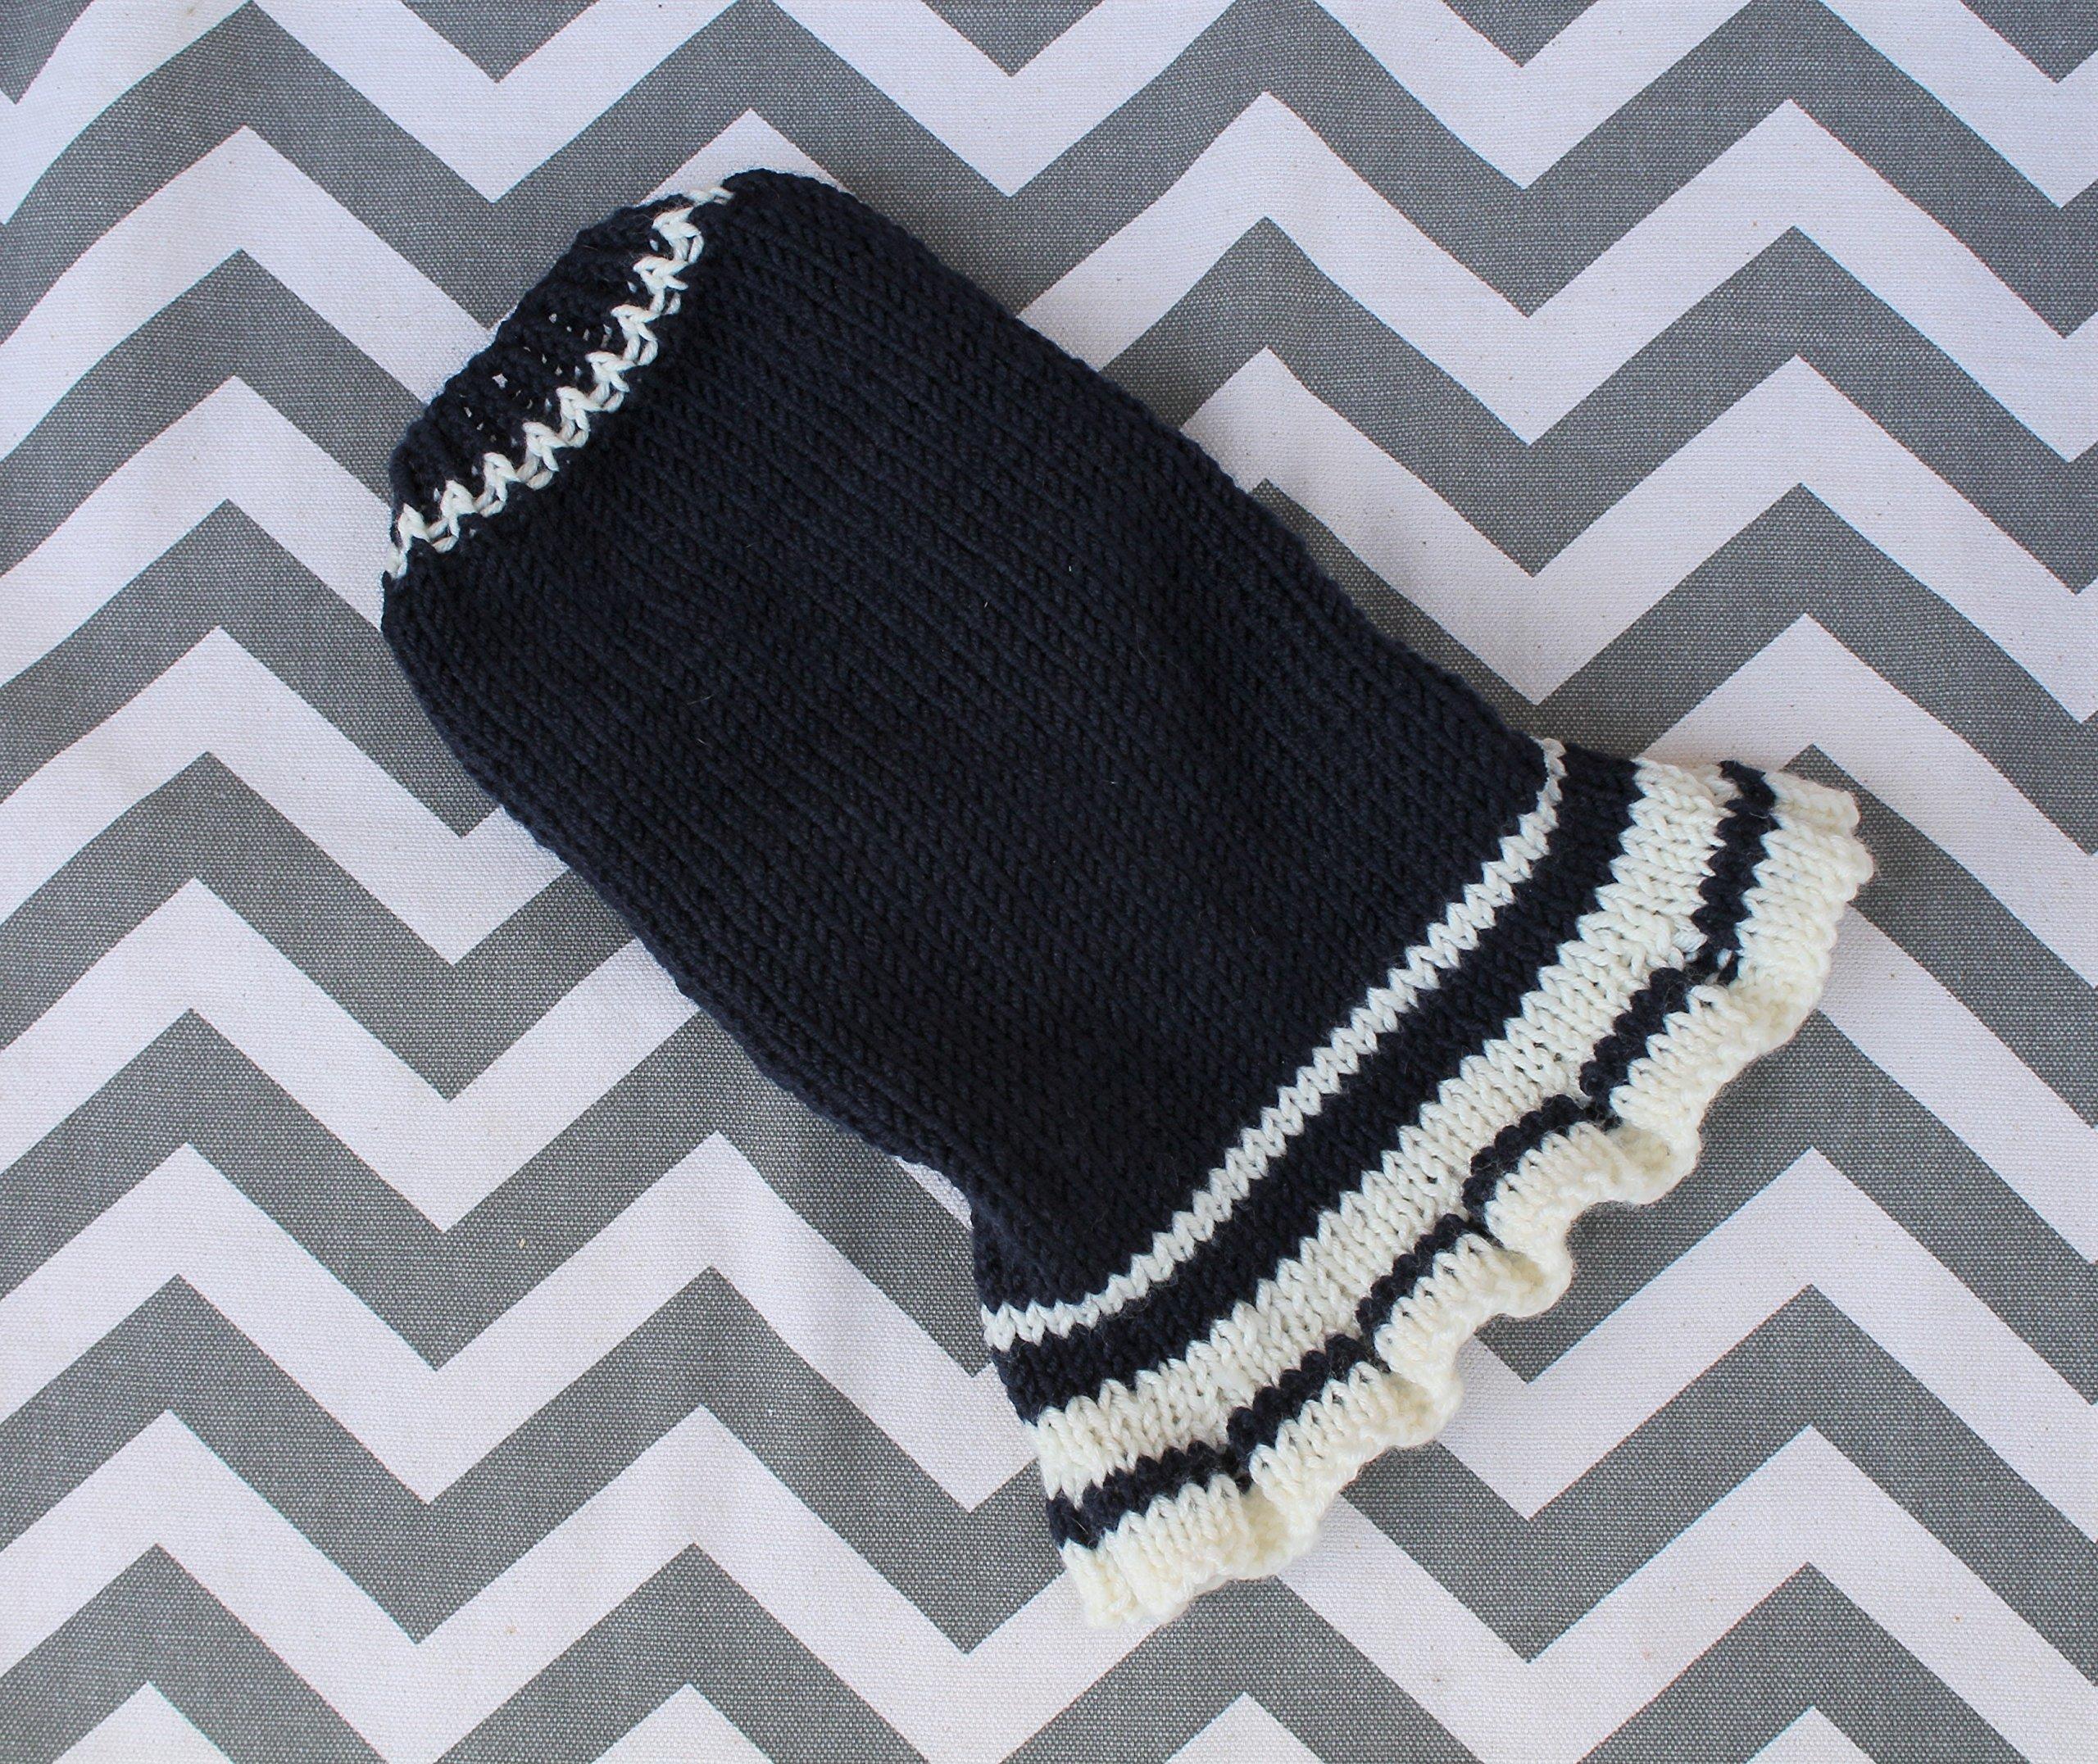 Merino Wool Dog Puppy Sweater XXS/XS 2 1/2 to 4 Lbs Cheer Schoolgirl Pleated Ruffle Dress Navy/White Chihuahua Yorkie Pomeranian Maltese Teacup